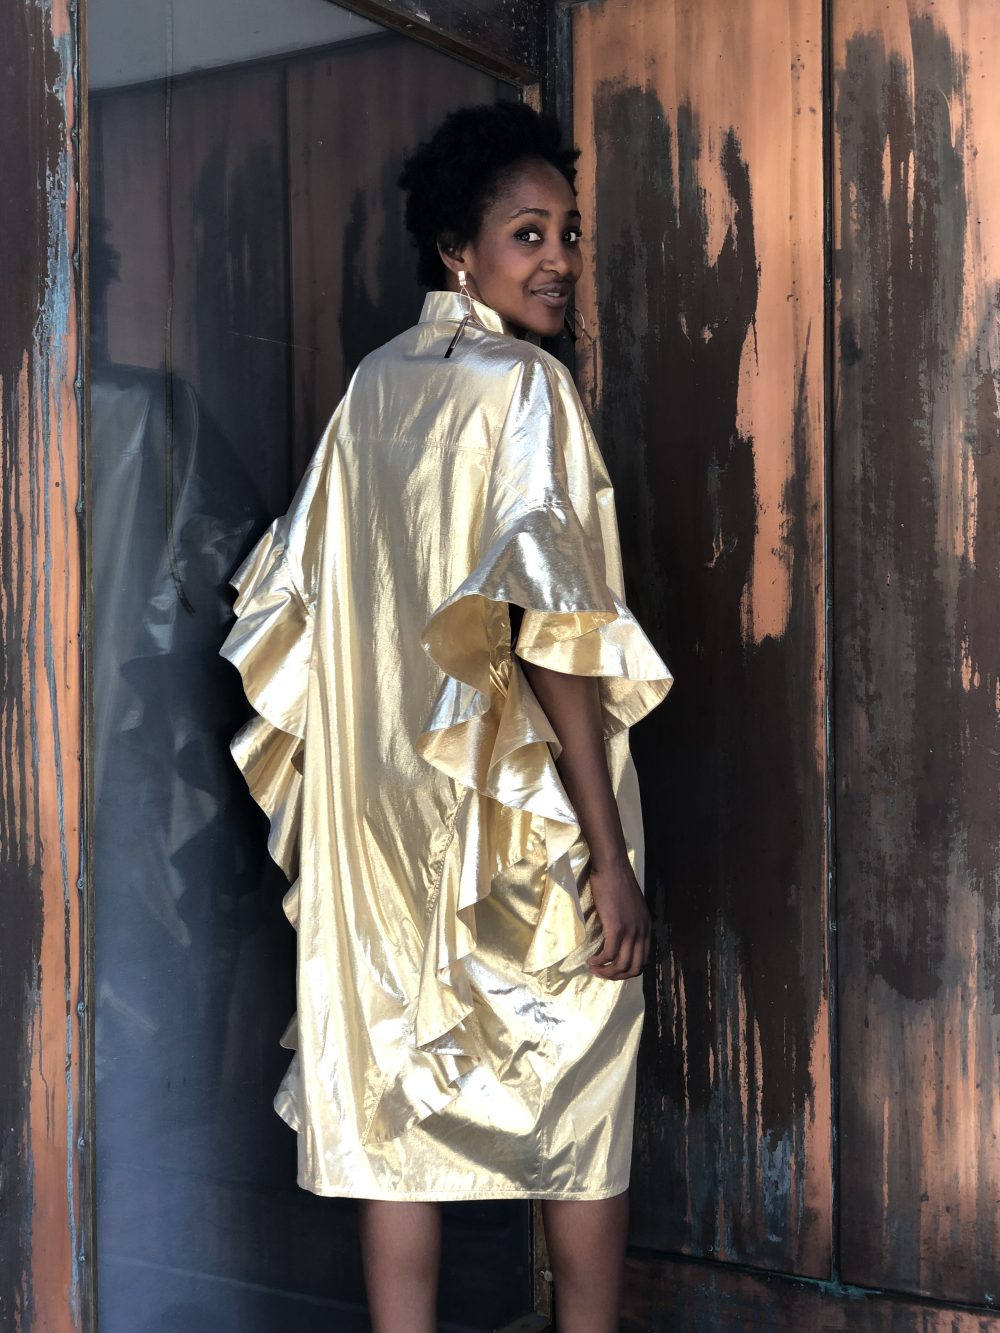 Vimma Ruffle Dress IRINA Special Gold Onesize - gold, IRINA, Onesize, Ruffle Dress, Special